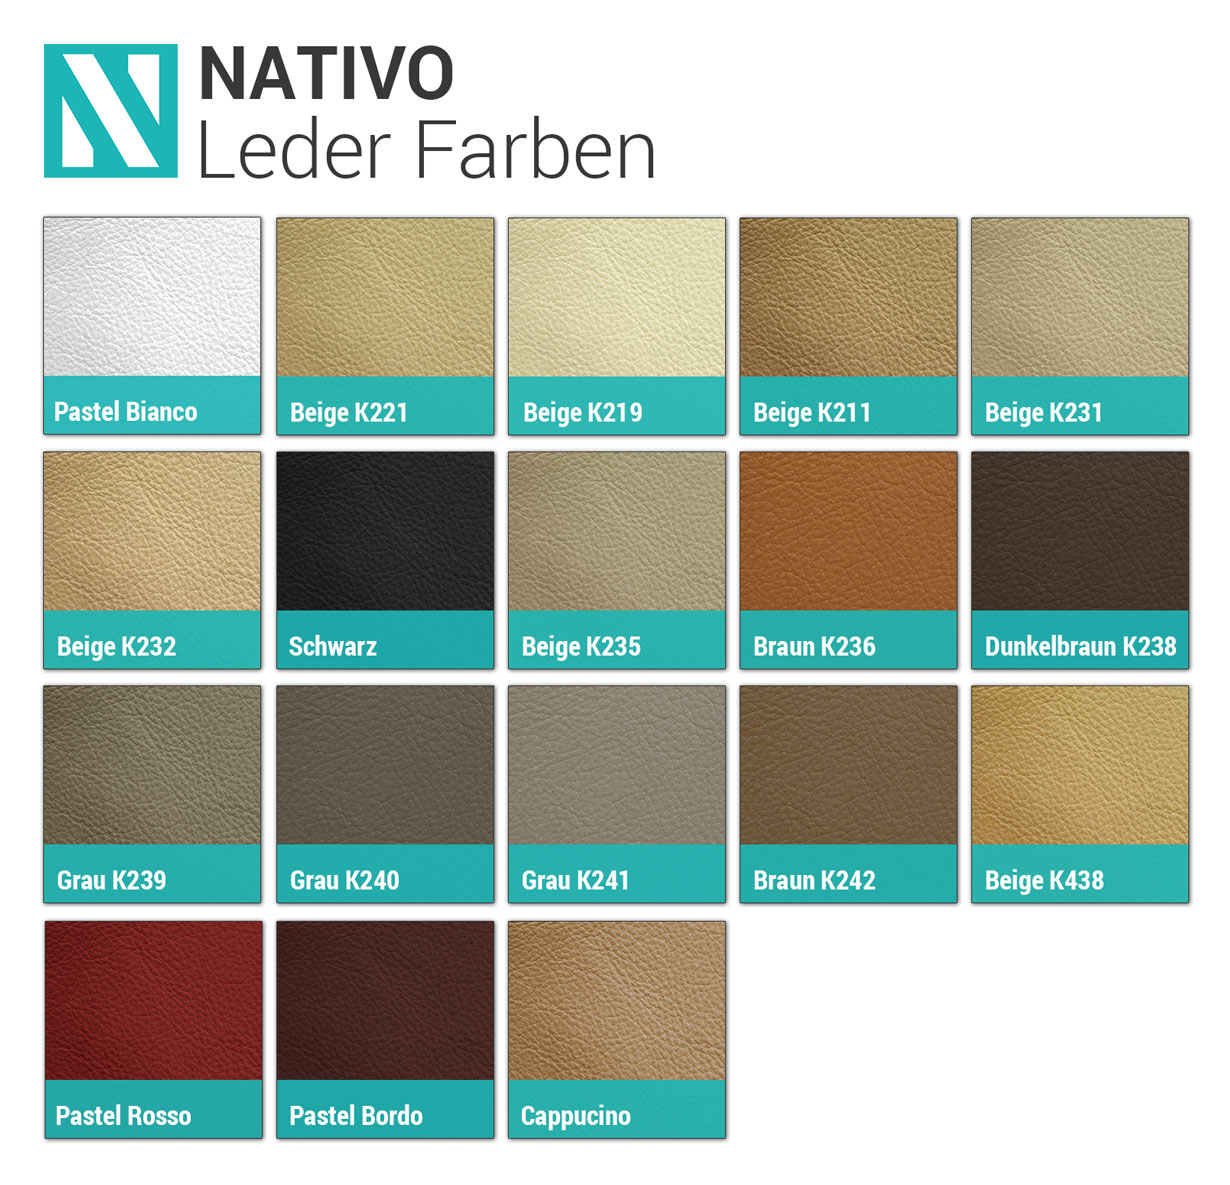 NATIVO Leder Farben